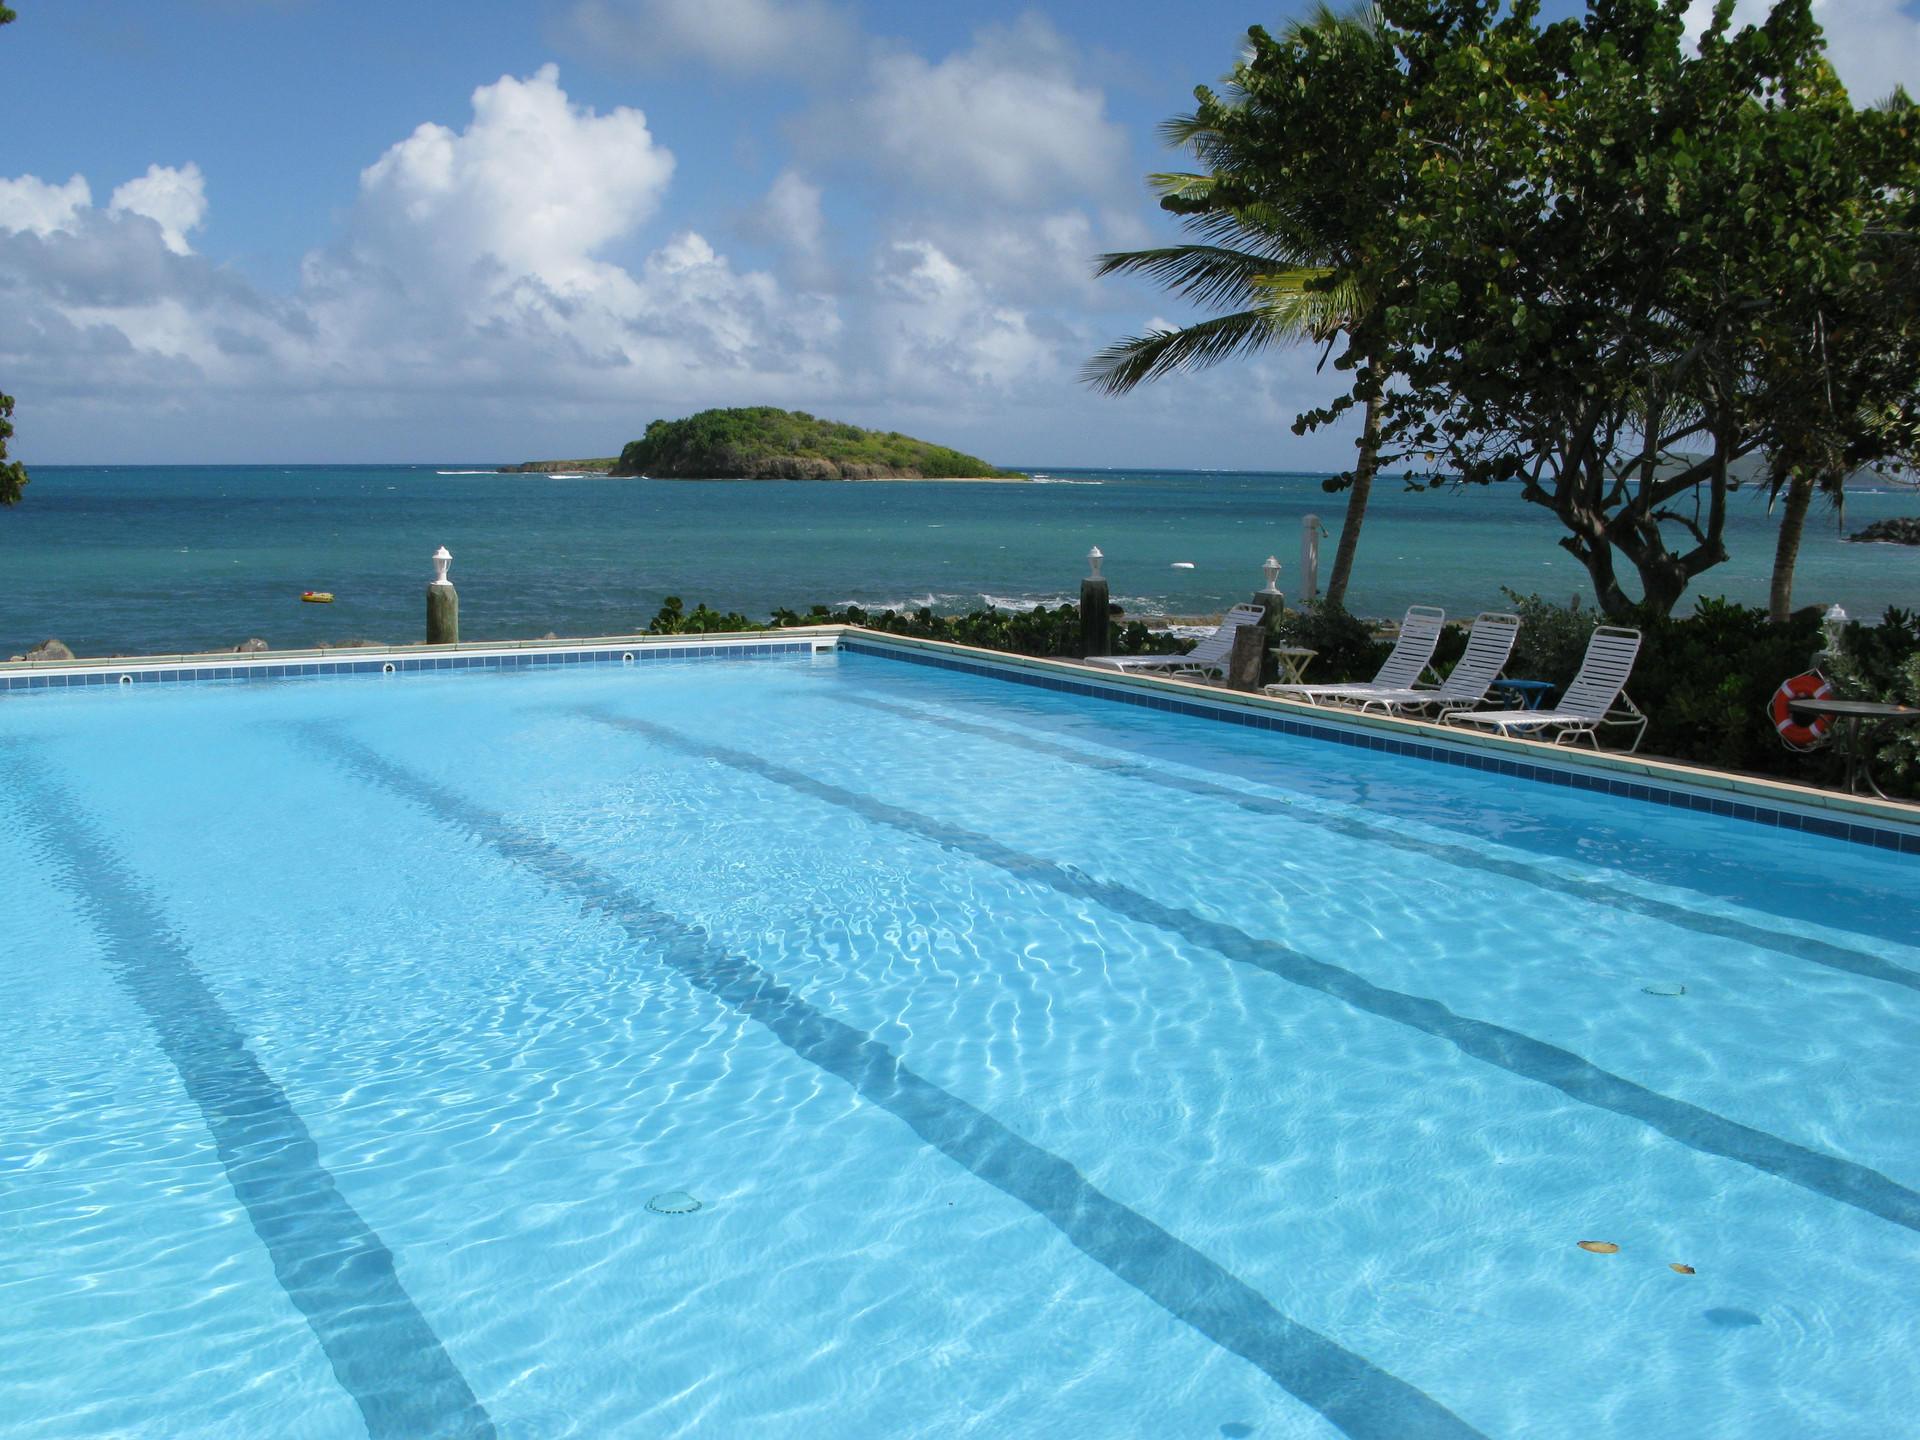 Pool with ocean view at Tamarind Reef Resort